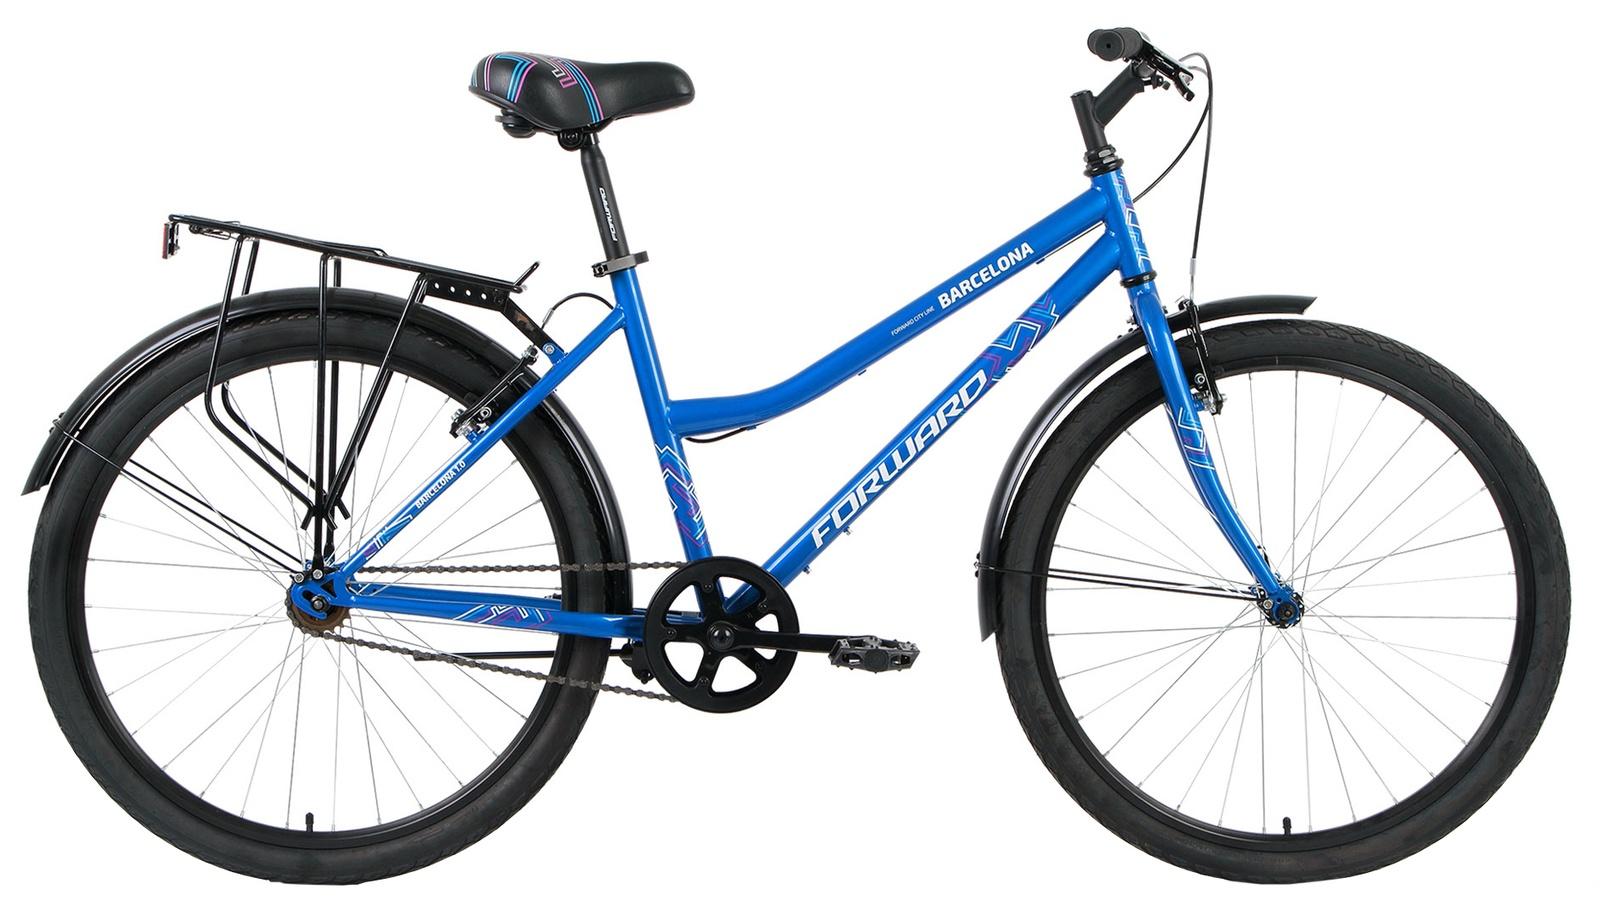 Дорожный Forward Barcelona 1.0, RBKW8UN61002, темно-синий велосипед forward barcelona 1 0 2017 1 скорость рама 17 синий